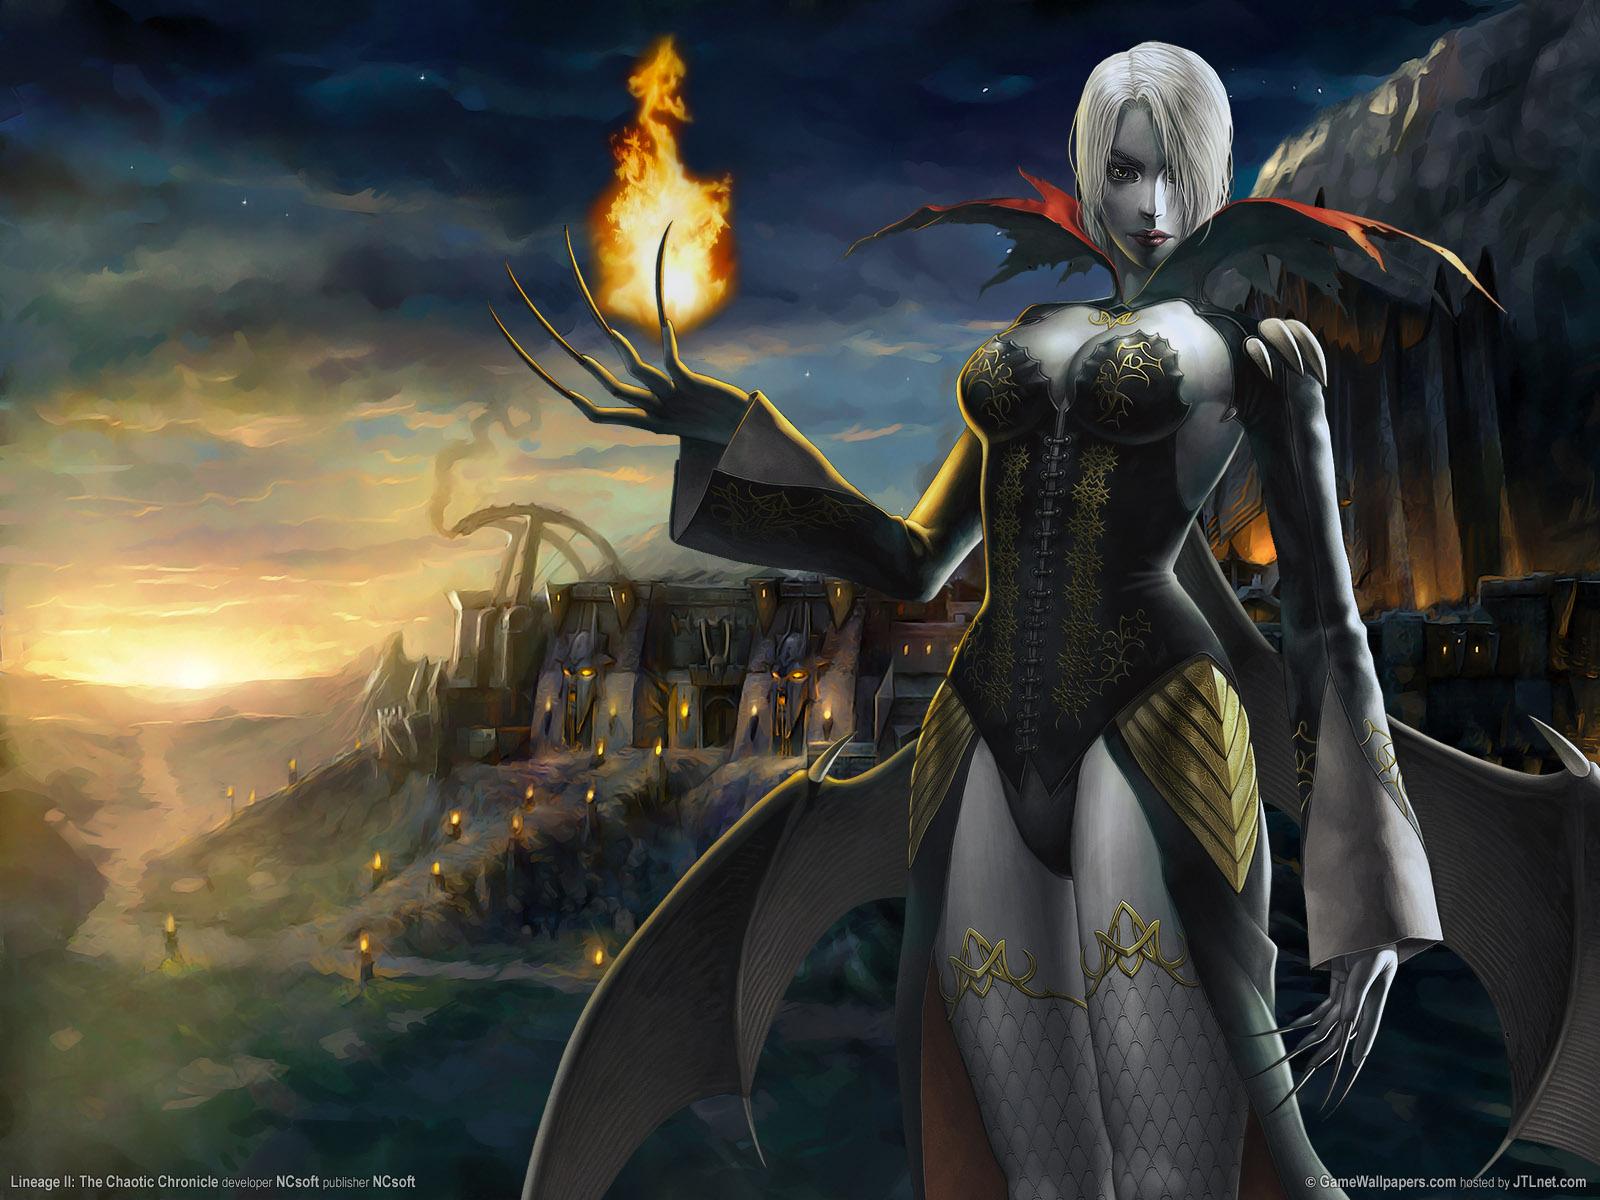 dark elf lineage ii chaotic chronicle wallpaper dark elf wallpaper gw 1600x1200